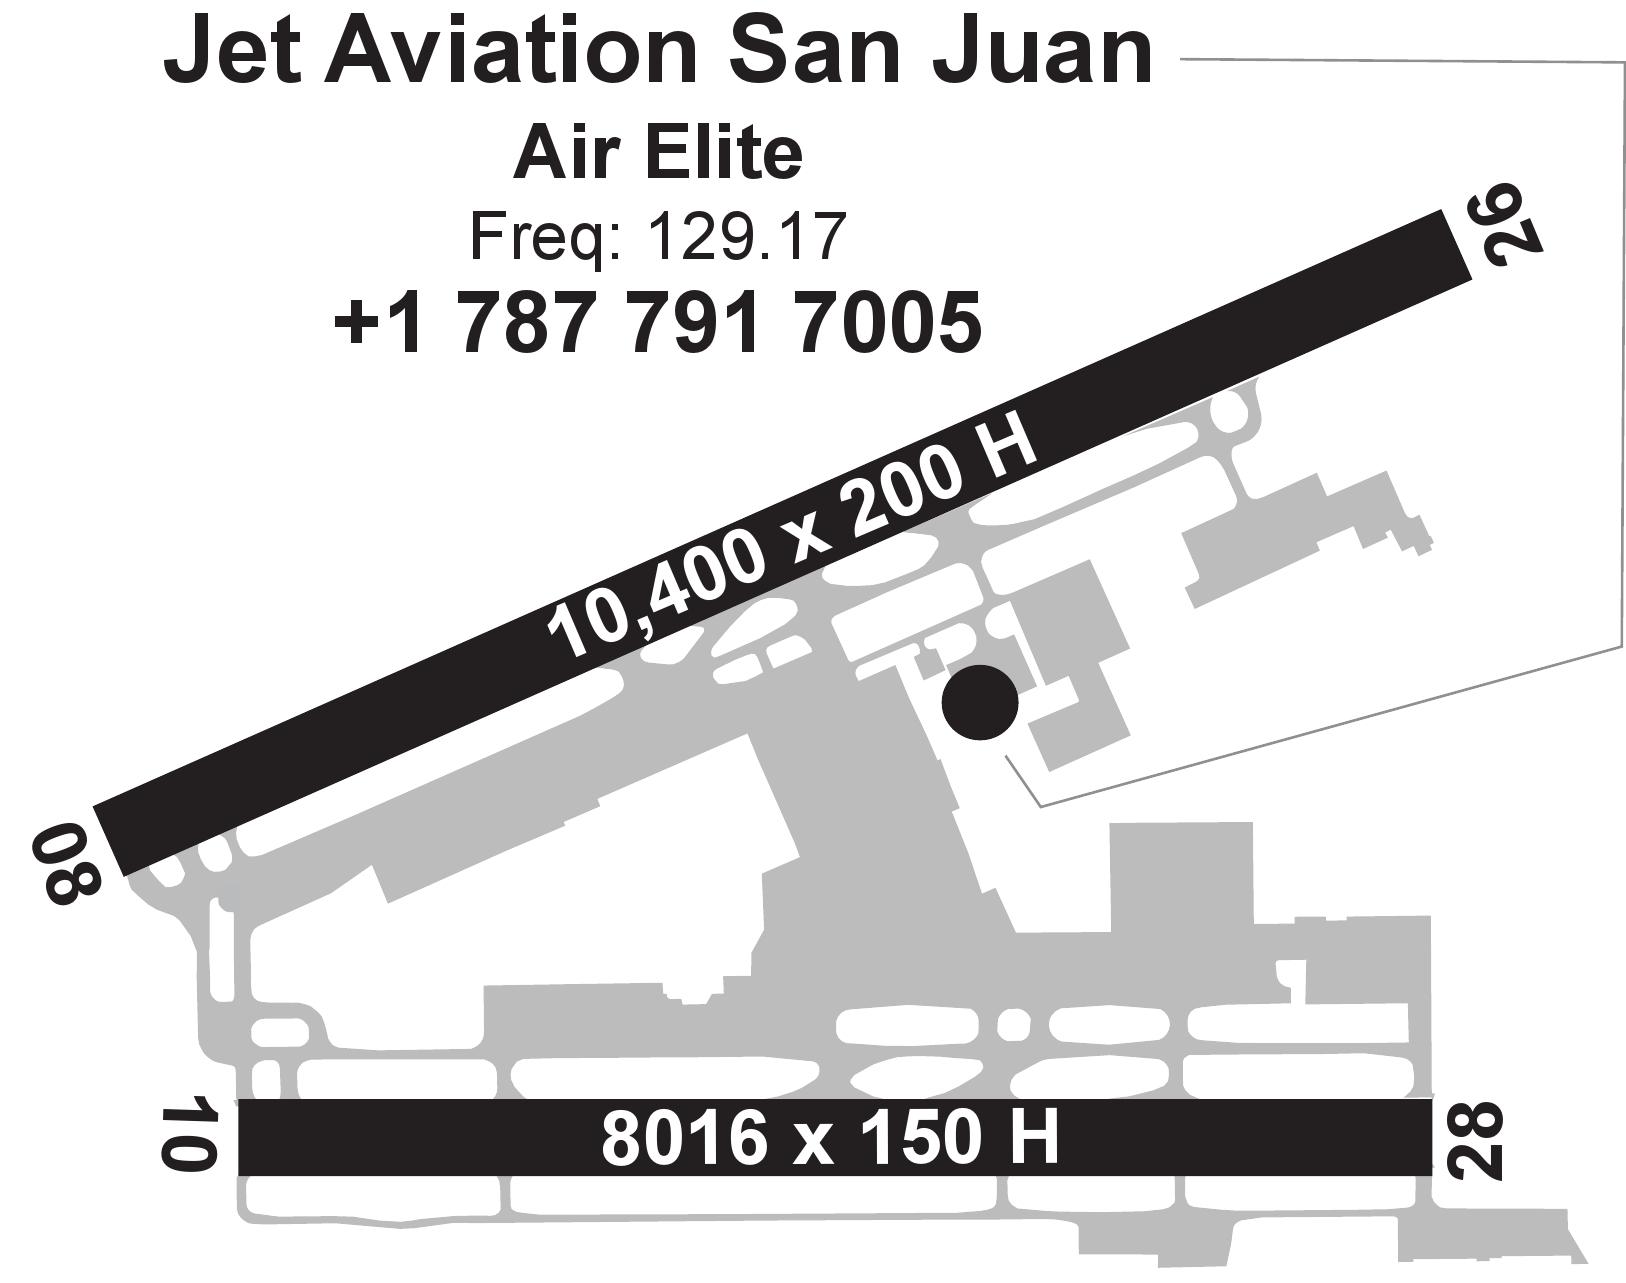 Jet Aviation San Juan